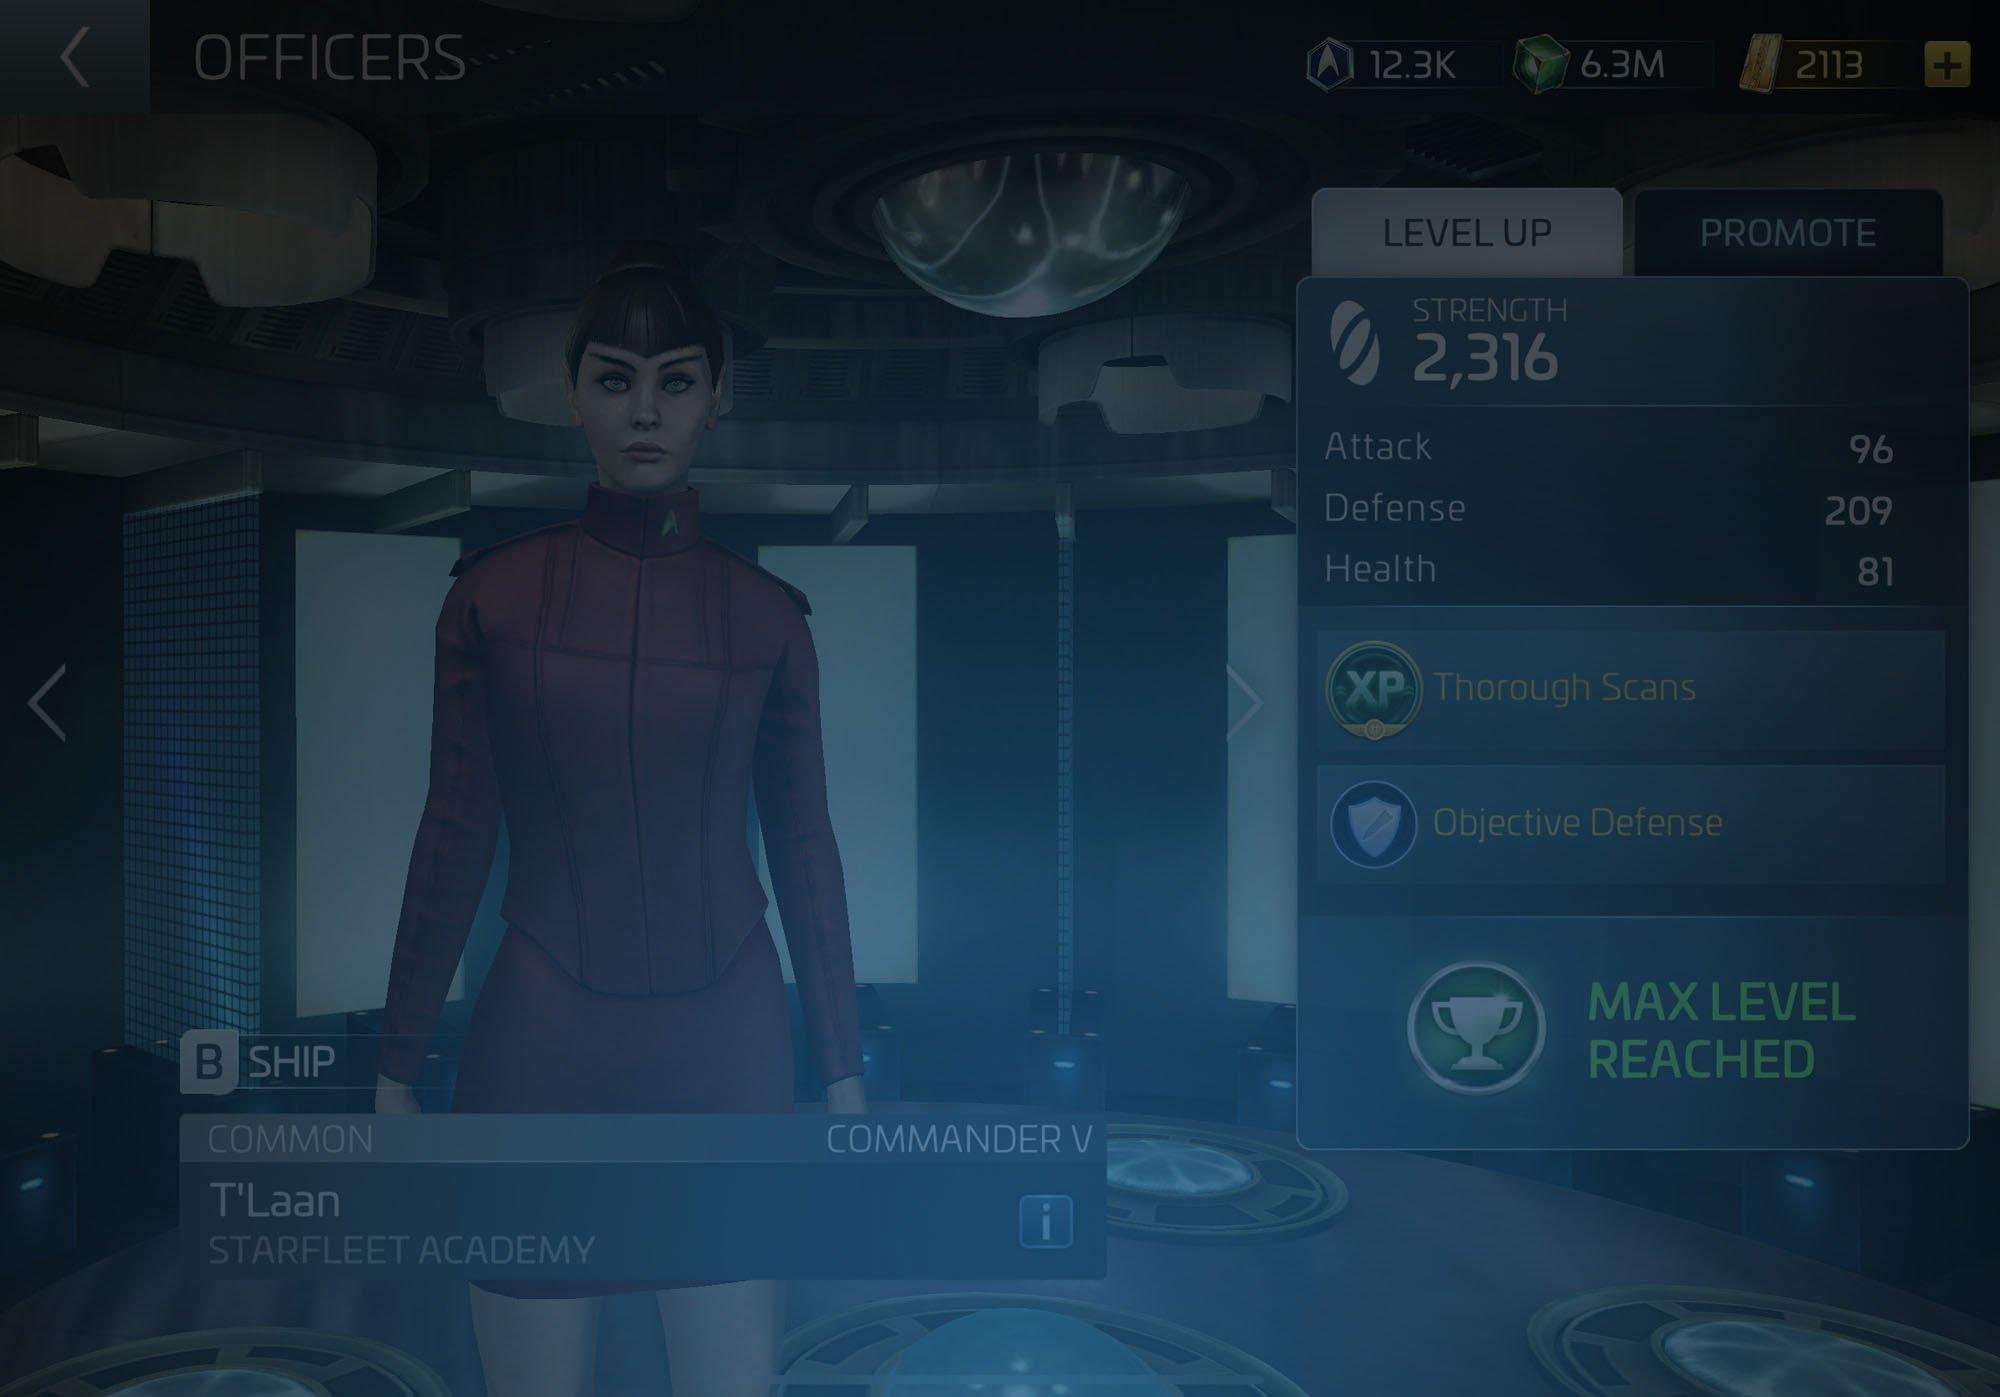 Officer T'Laan